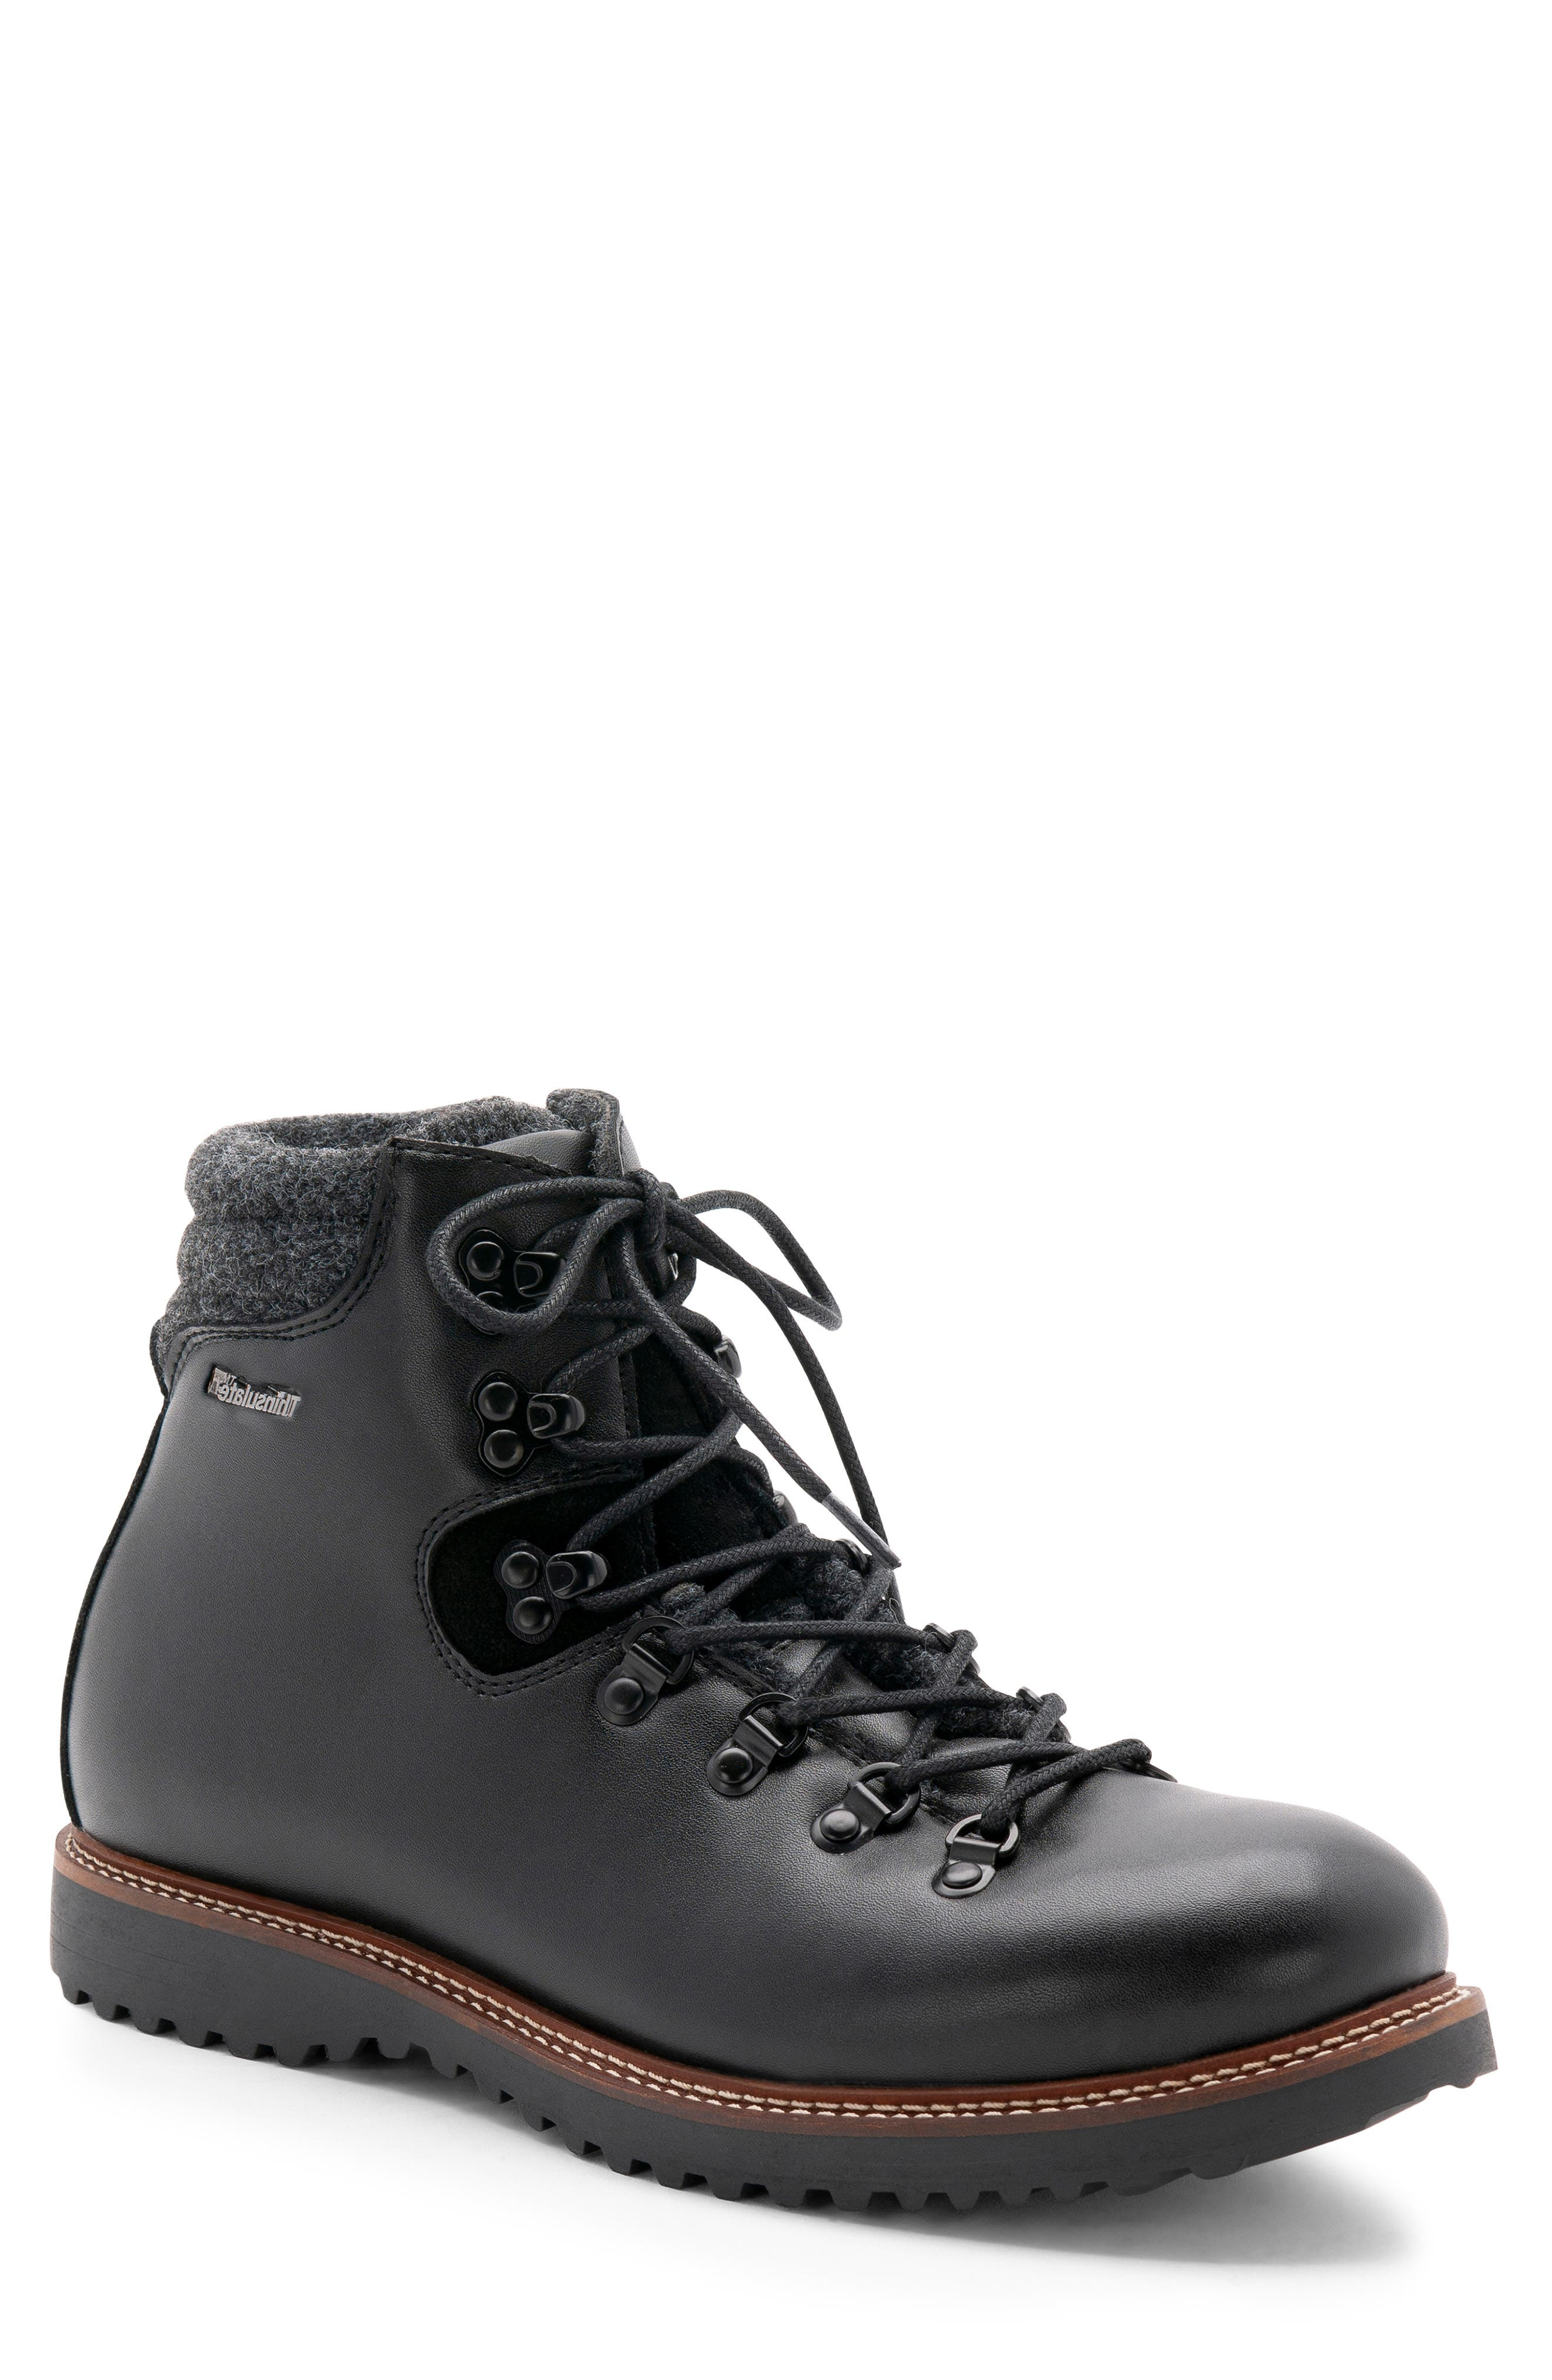 Morgan Waterproof Plain Toe Boot,                             Main thumbnail 1, color,                             BLACK LEATHER